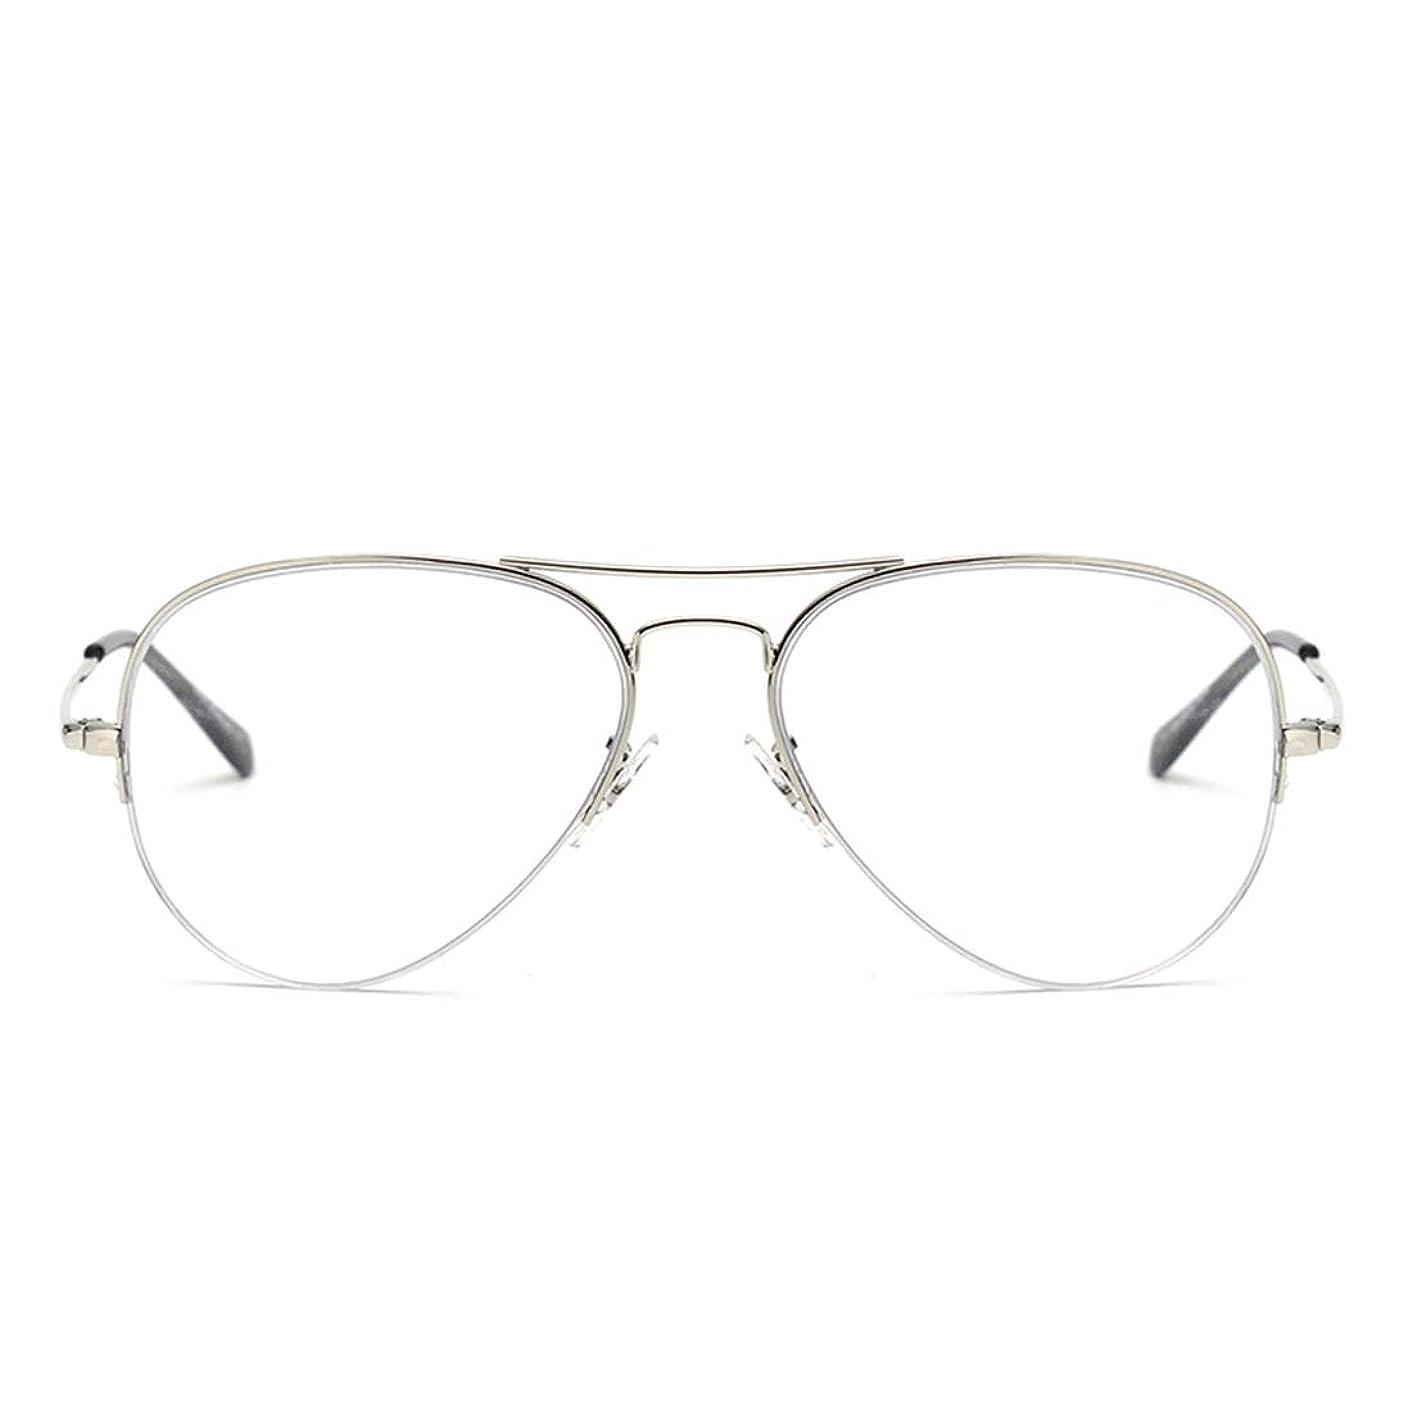 CHICLI Blue Light Blocking Computer Glasses Retro Rimless Video Eyeglasses Reduce Eye Strain Anti Glare Clear Lens Men Women Silver